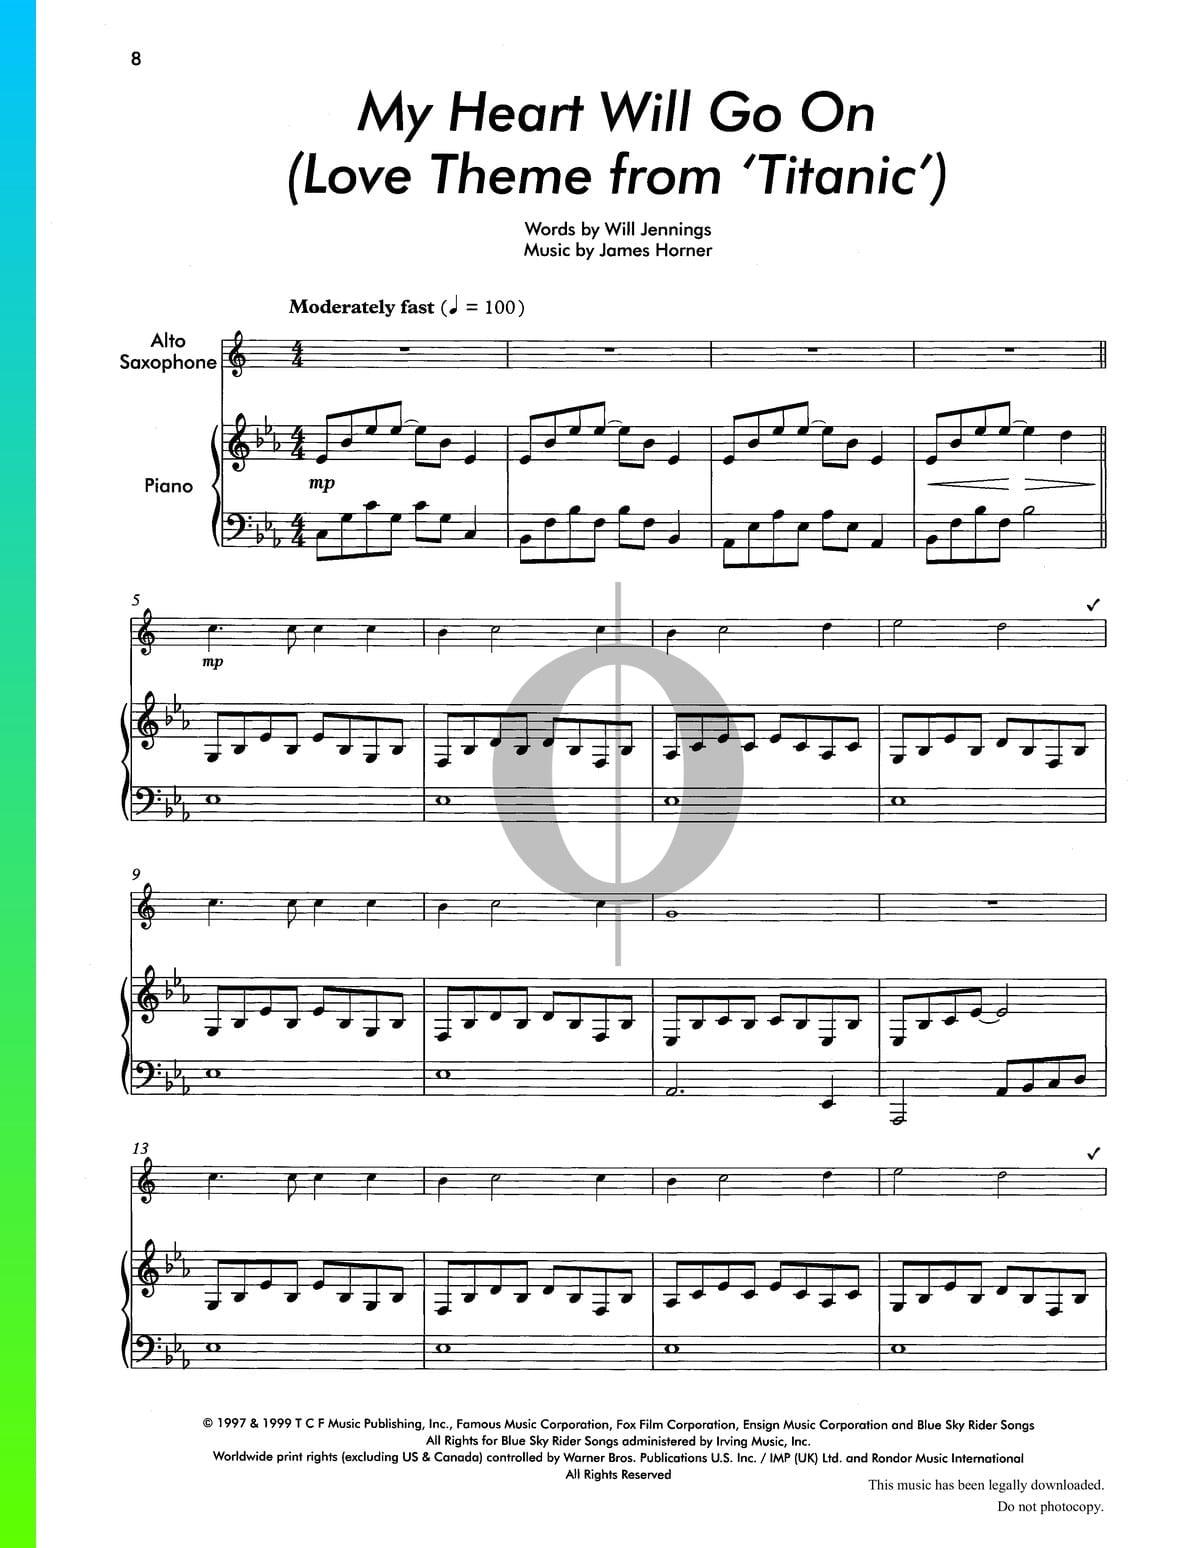 ▷ My Heart Will Go On Sheet Music (Piano, Saxophone) - PDF